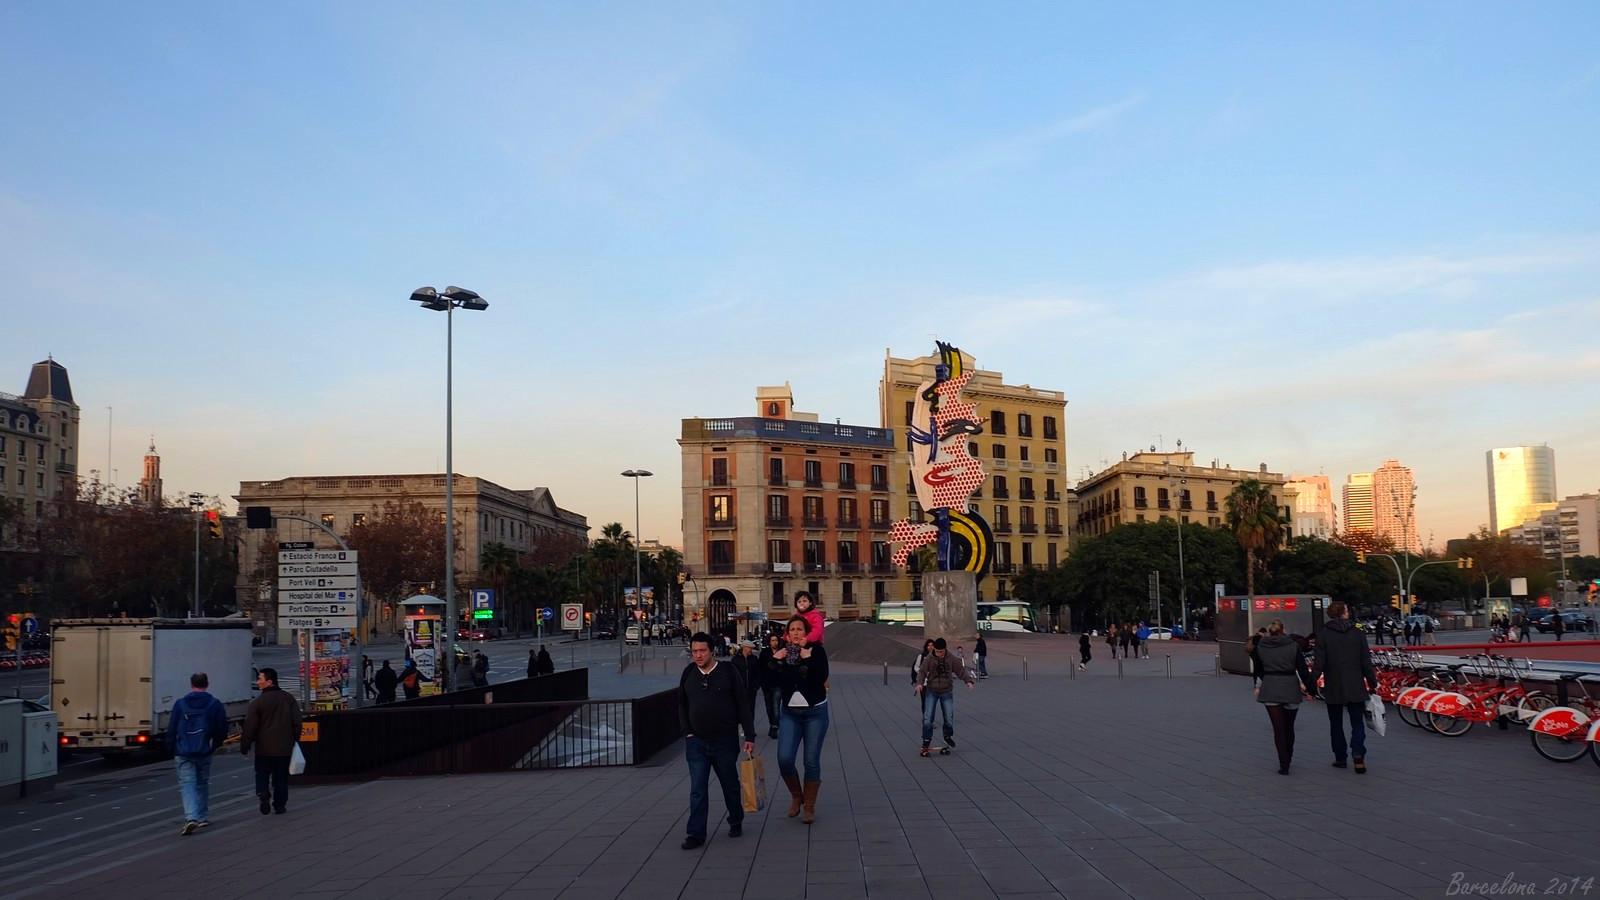 Barcelona day_1, La Cara de Barcelona by Roy Lichtenstein